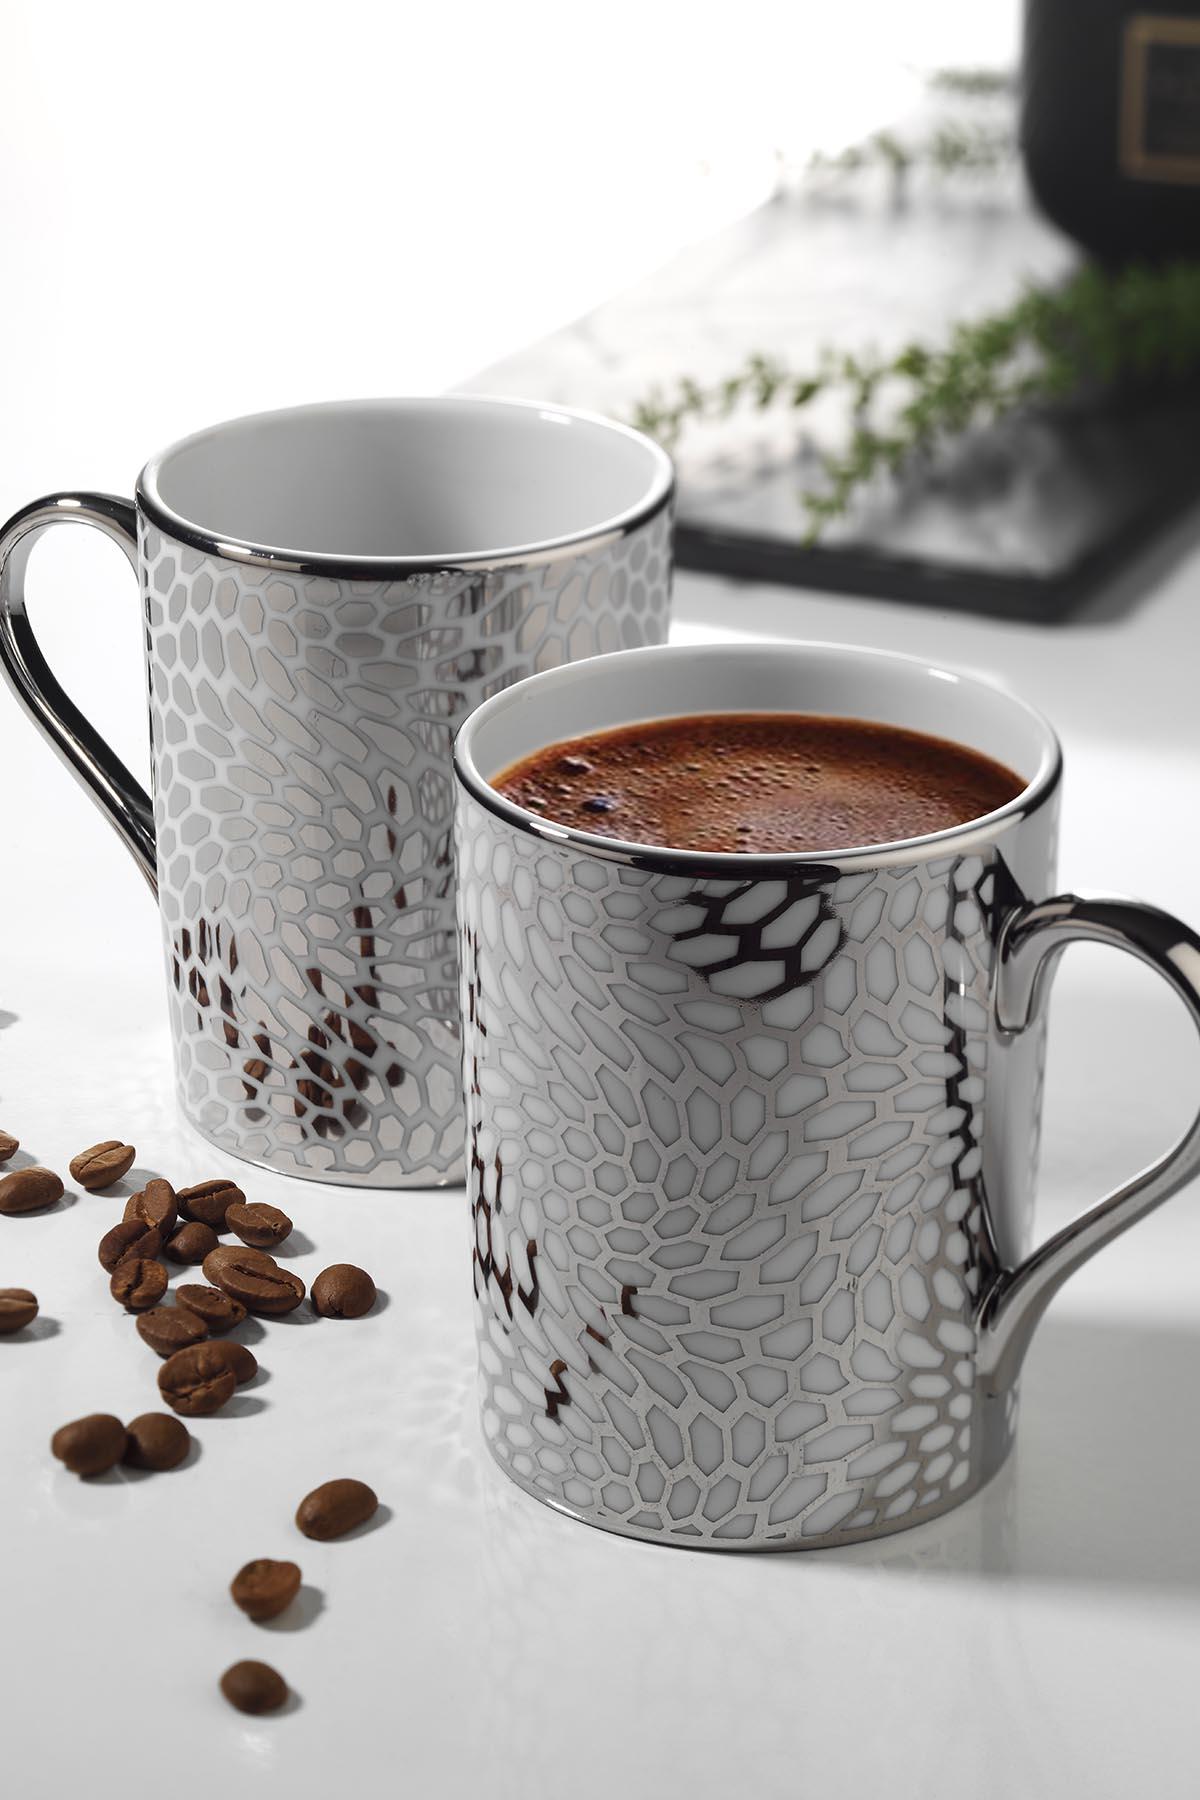 Kütahya Porselen - Kütahya Porselen Forest 2′li Mug Bardak Platin 10927